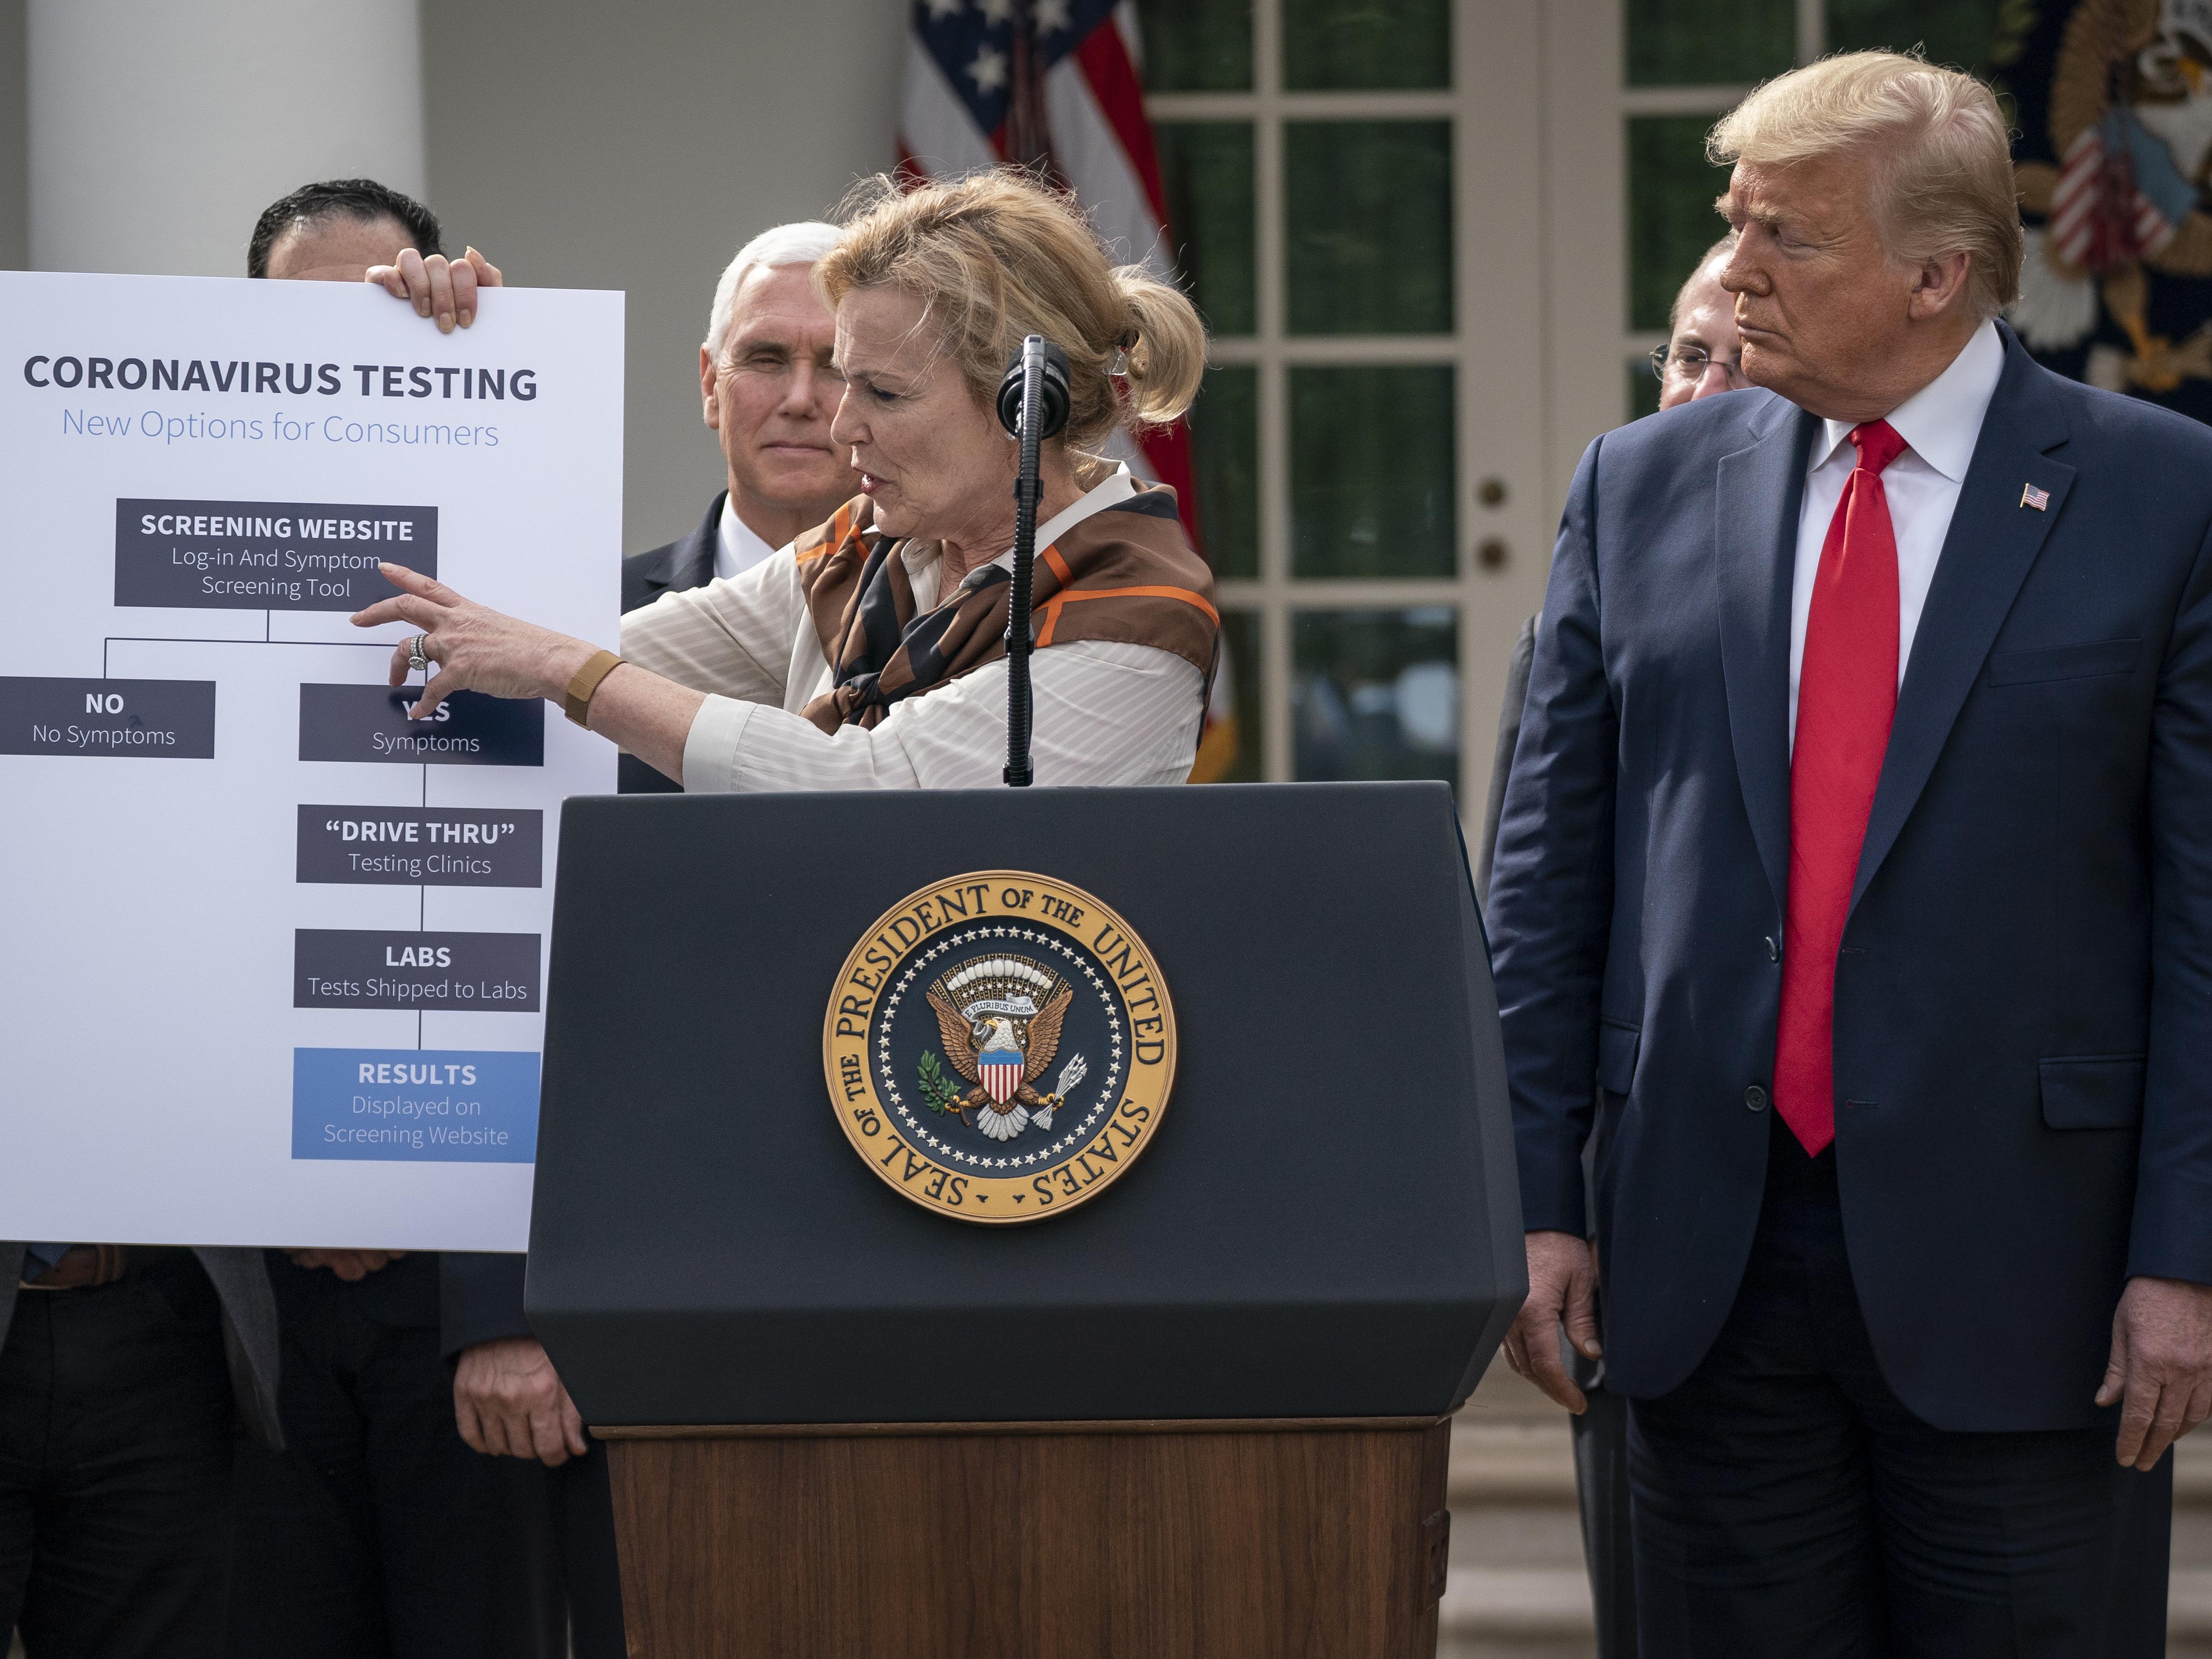 Trump says he has taken coronavirus test